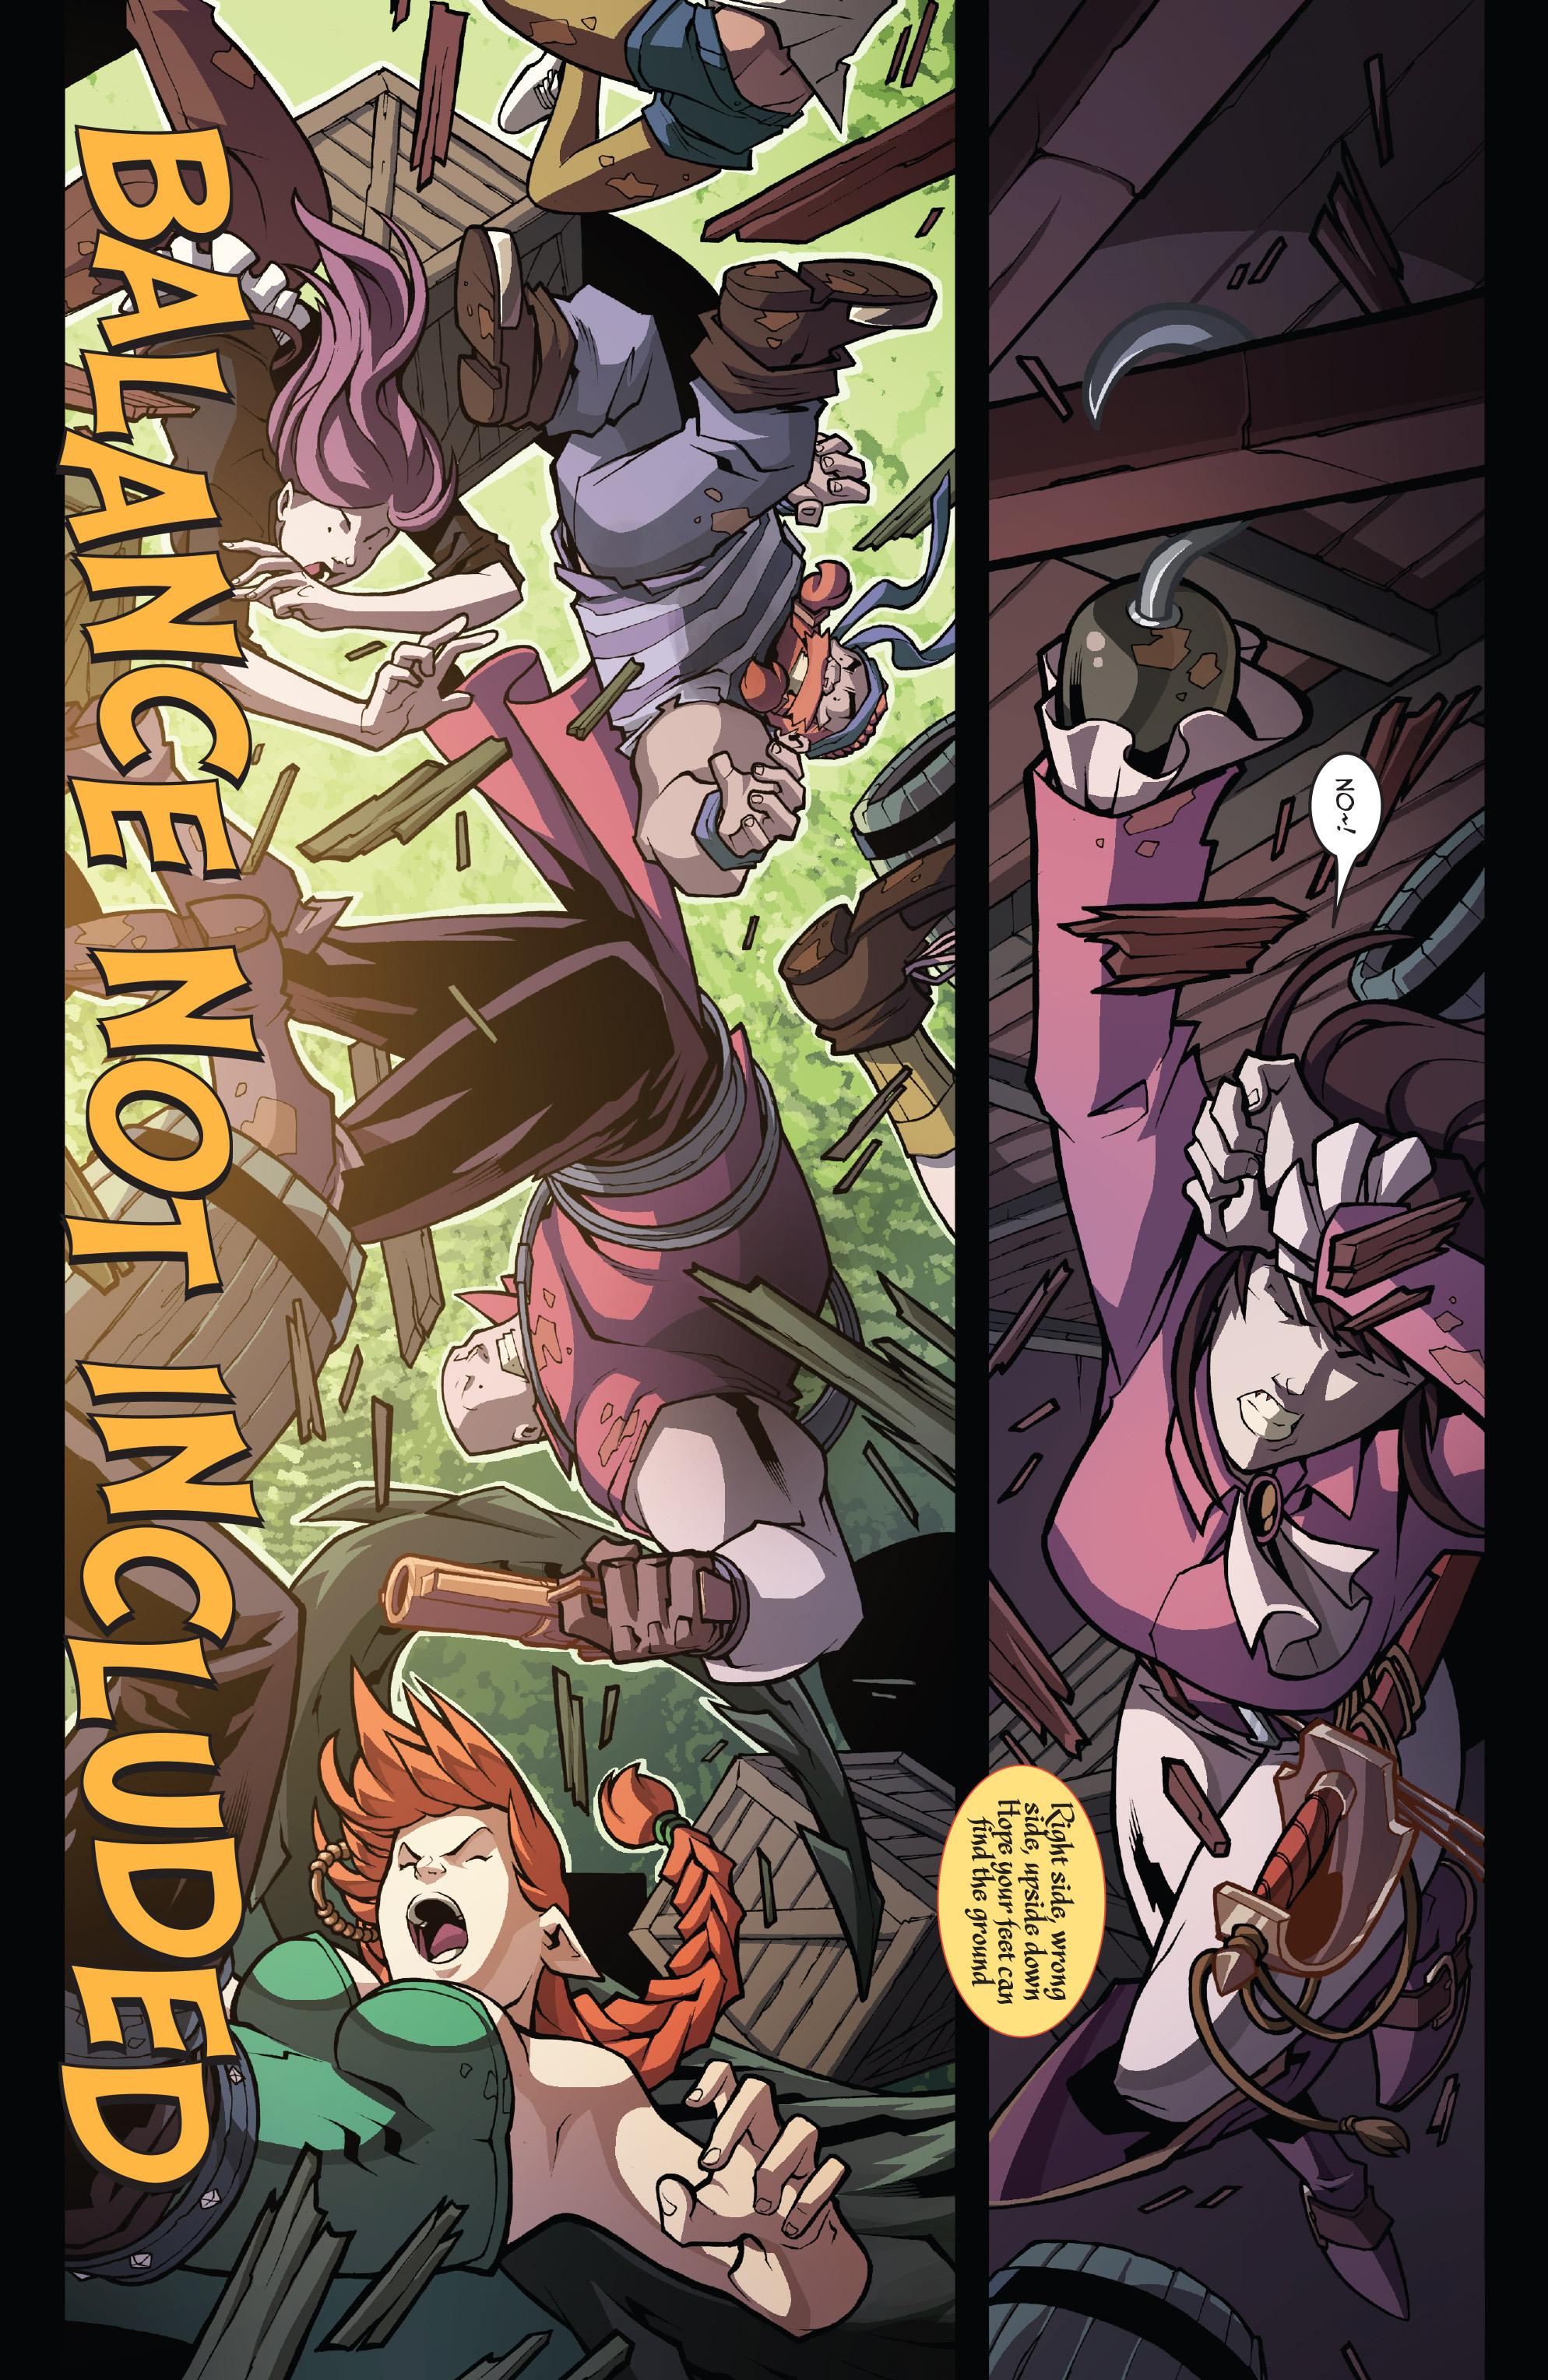 Read online Skullkickers comic -  Issue #16 - 20